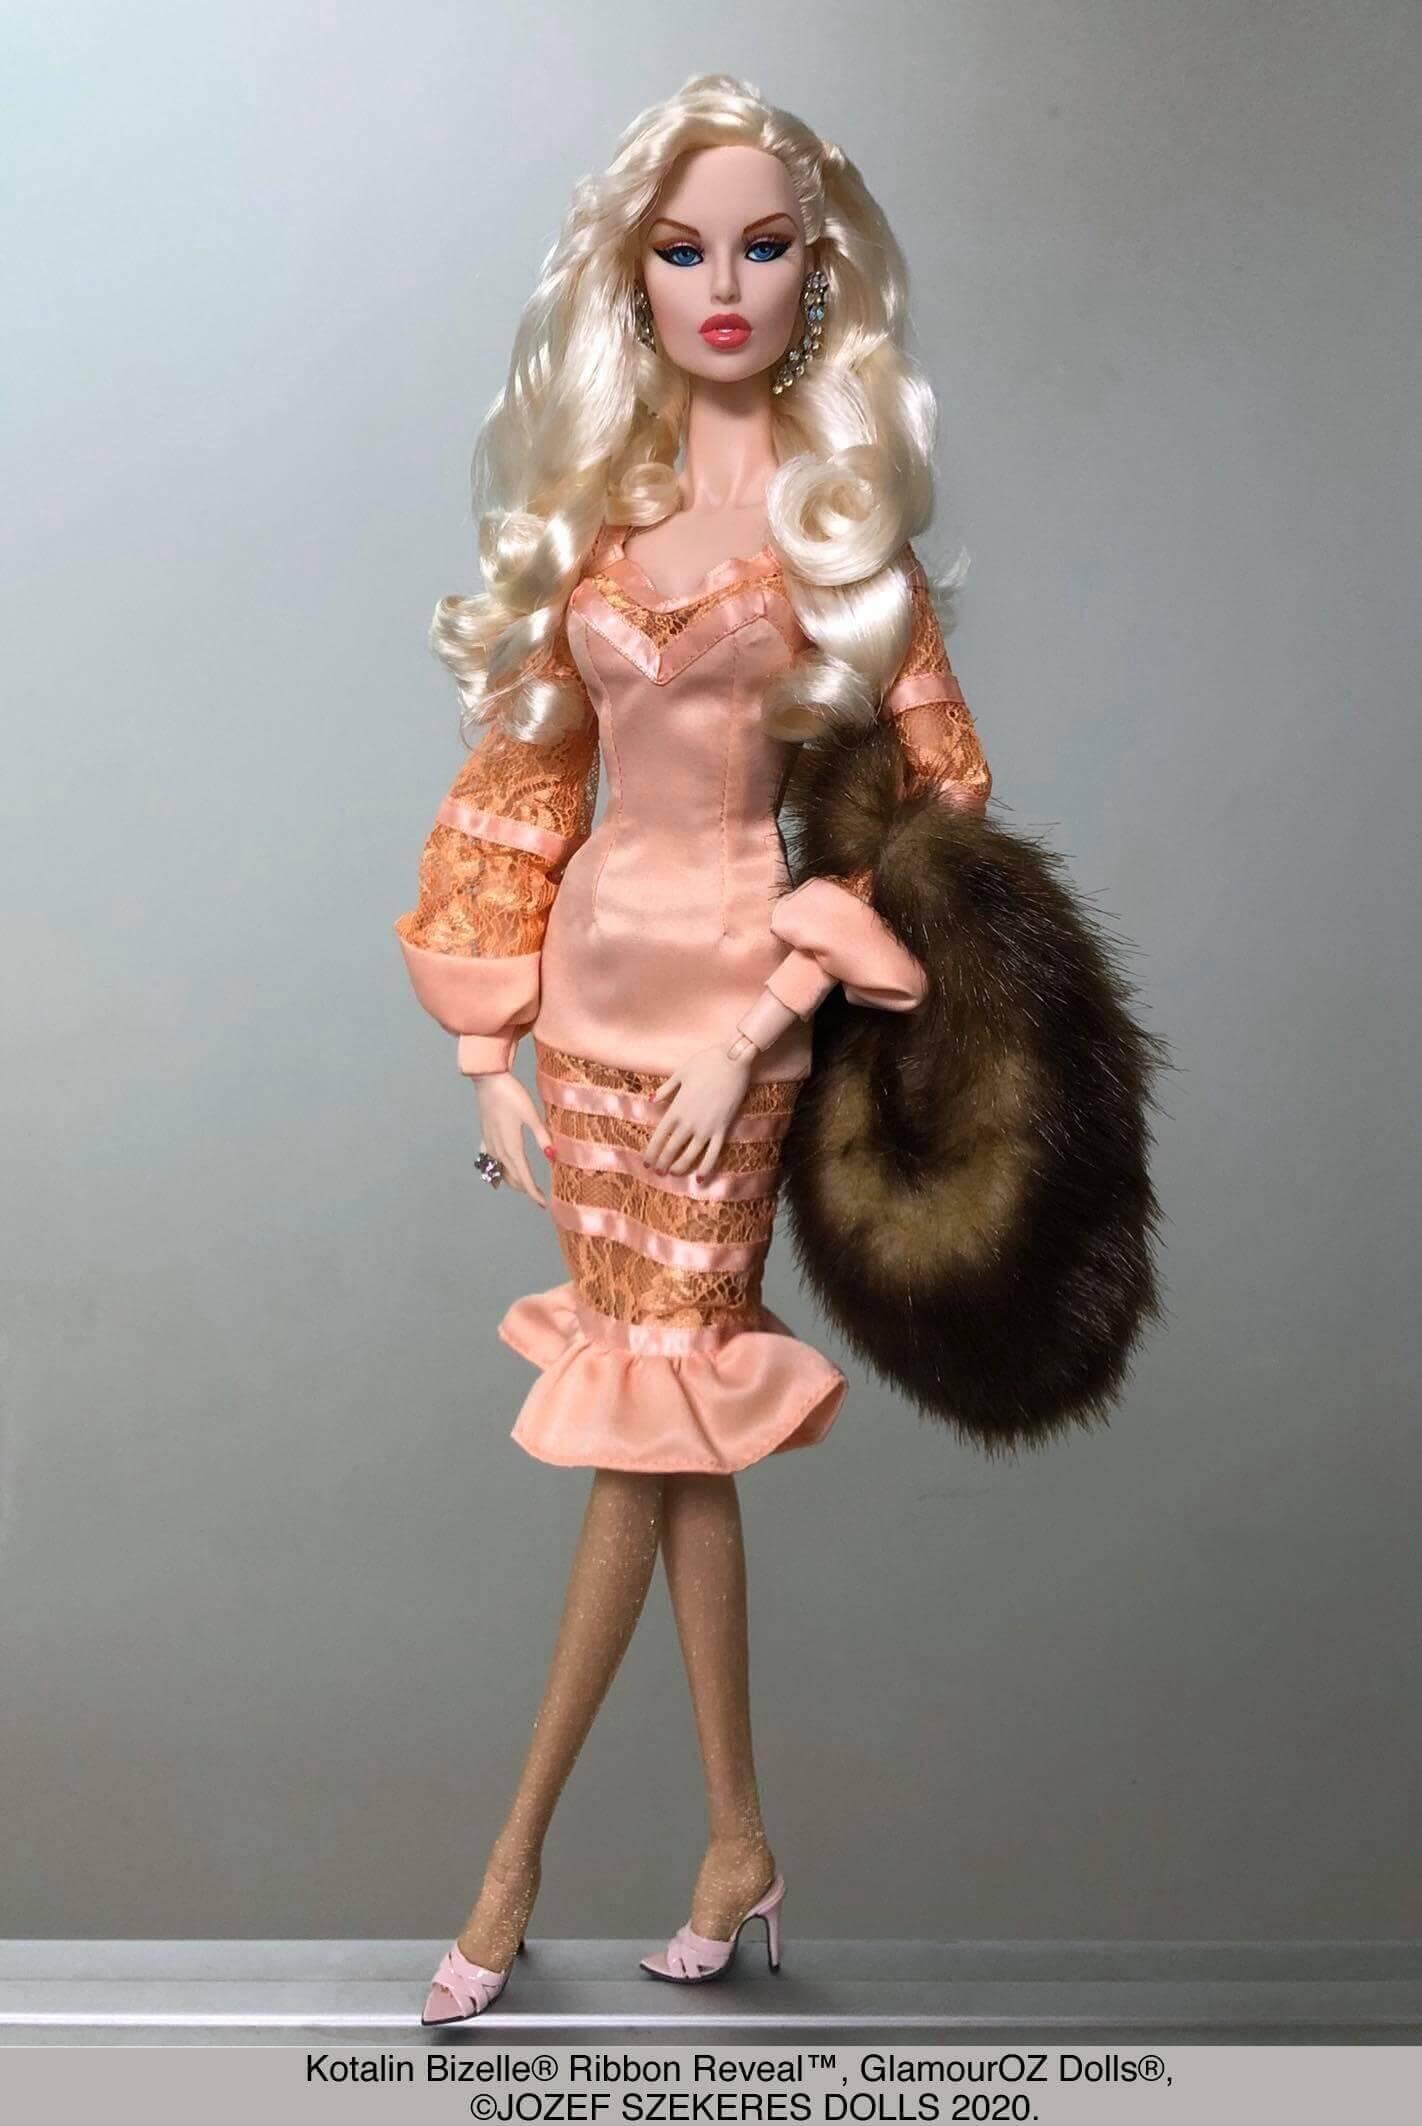 Glamouroz-Kotalin-Bizelle-Ribbon-Reveal